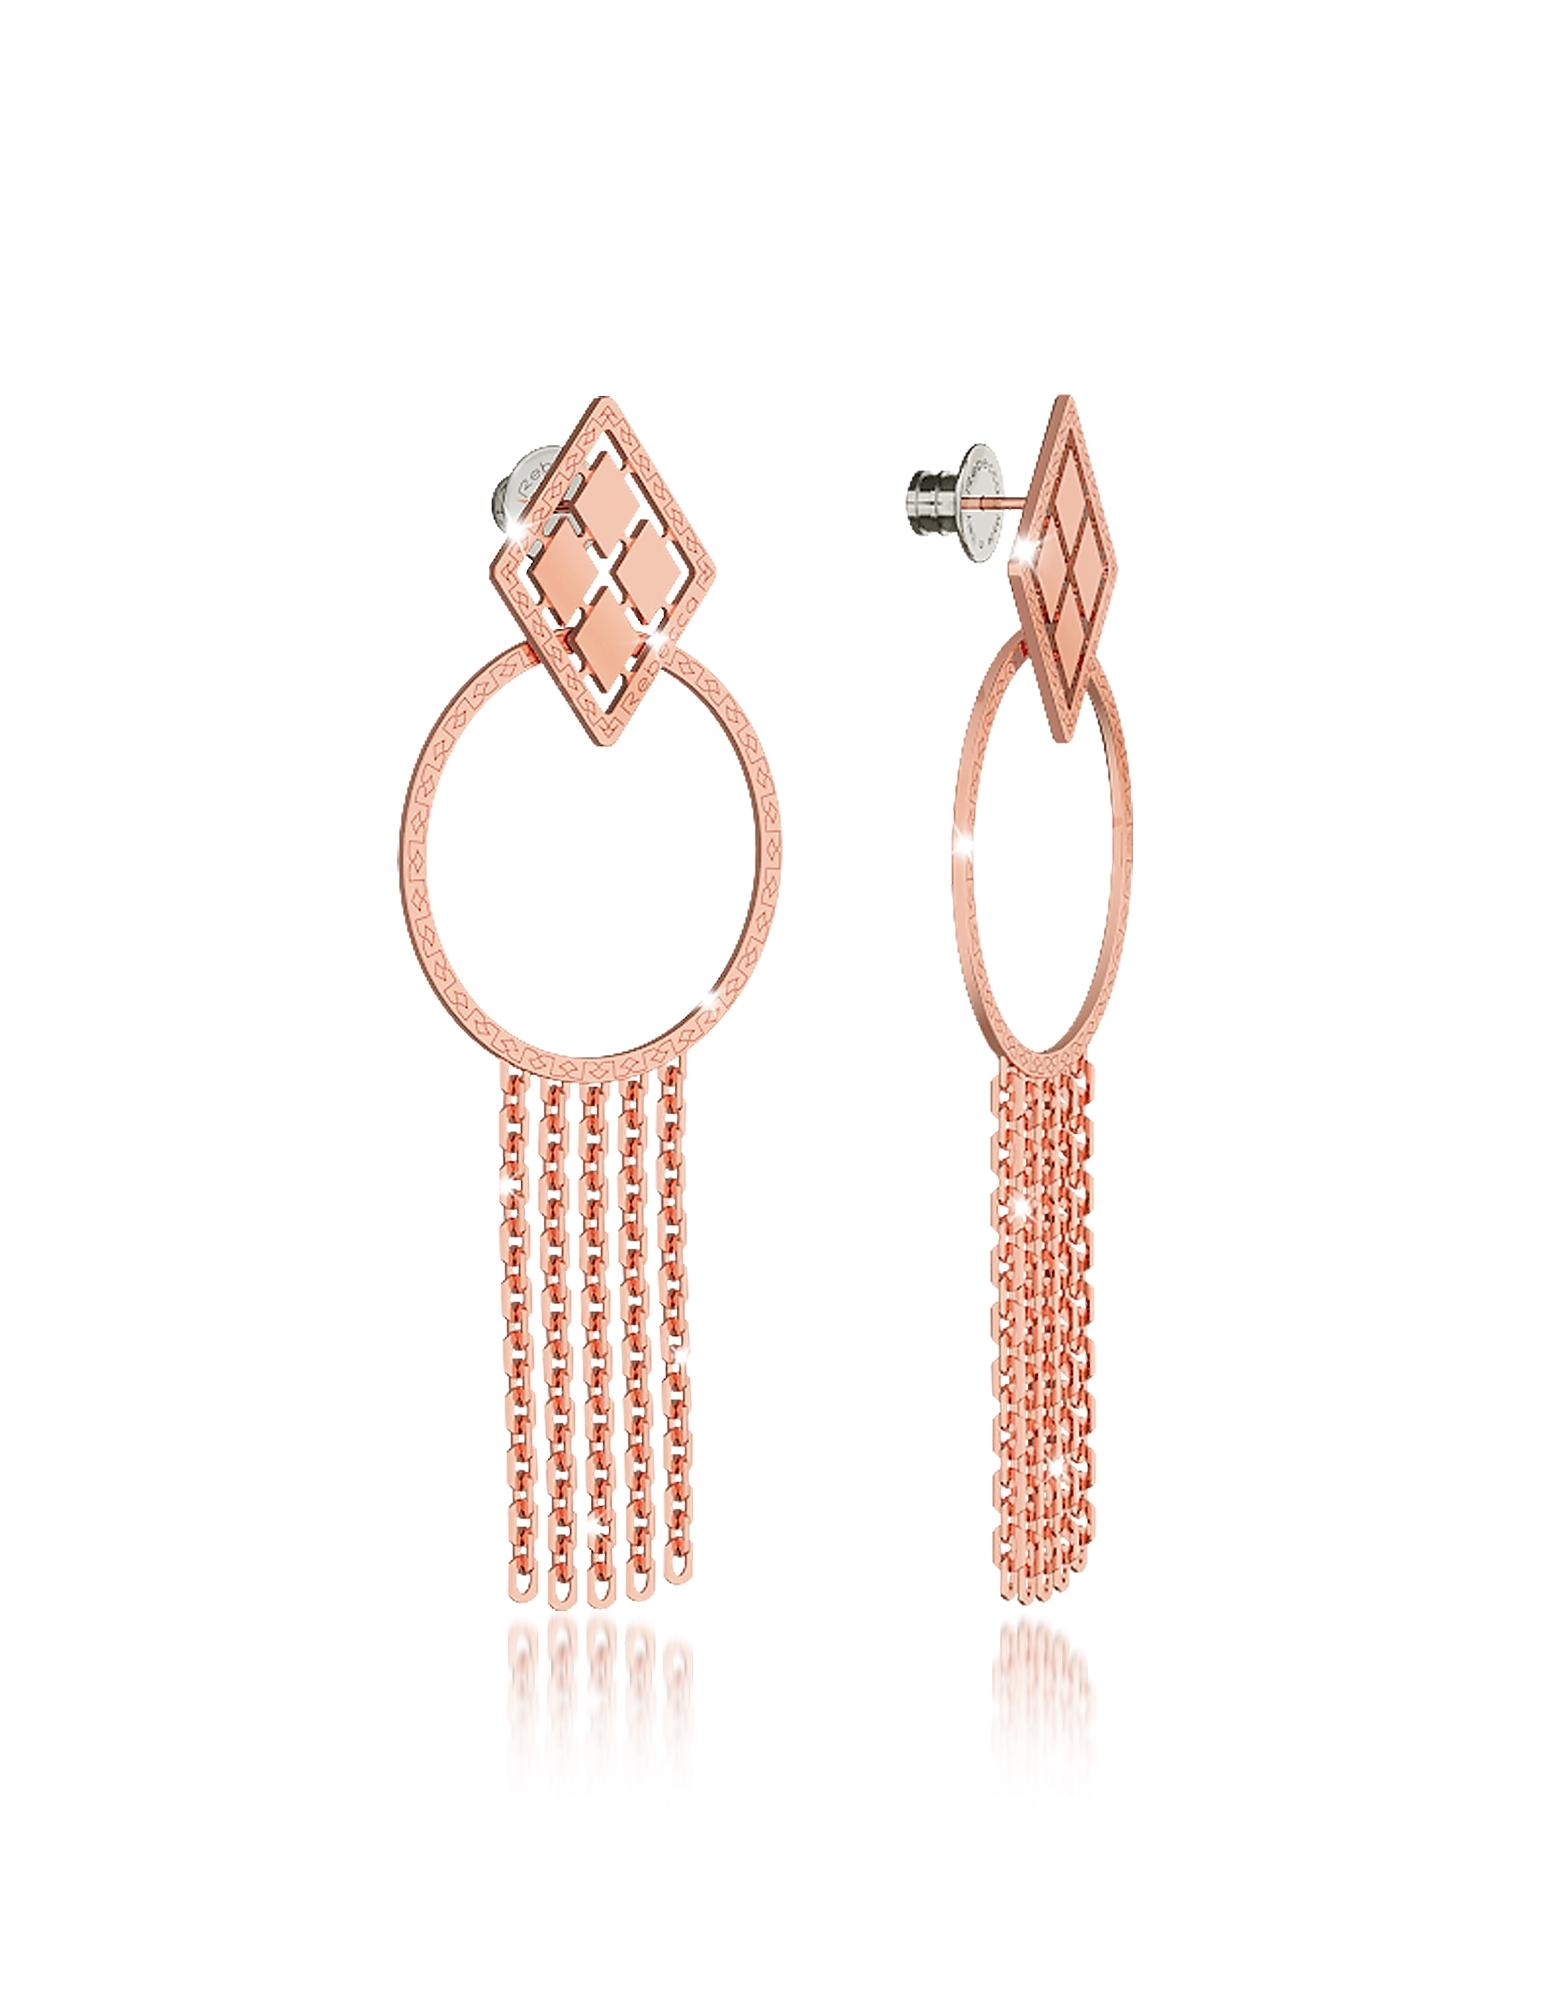 Rebecca Earrings, Melrose Rose Gold Over Bronze Drop Hoop Earrings w/Chain Fringes